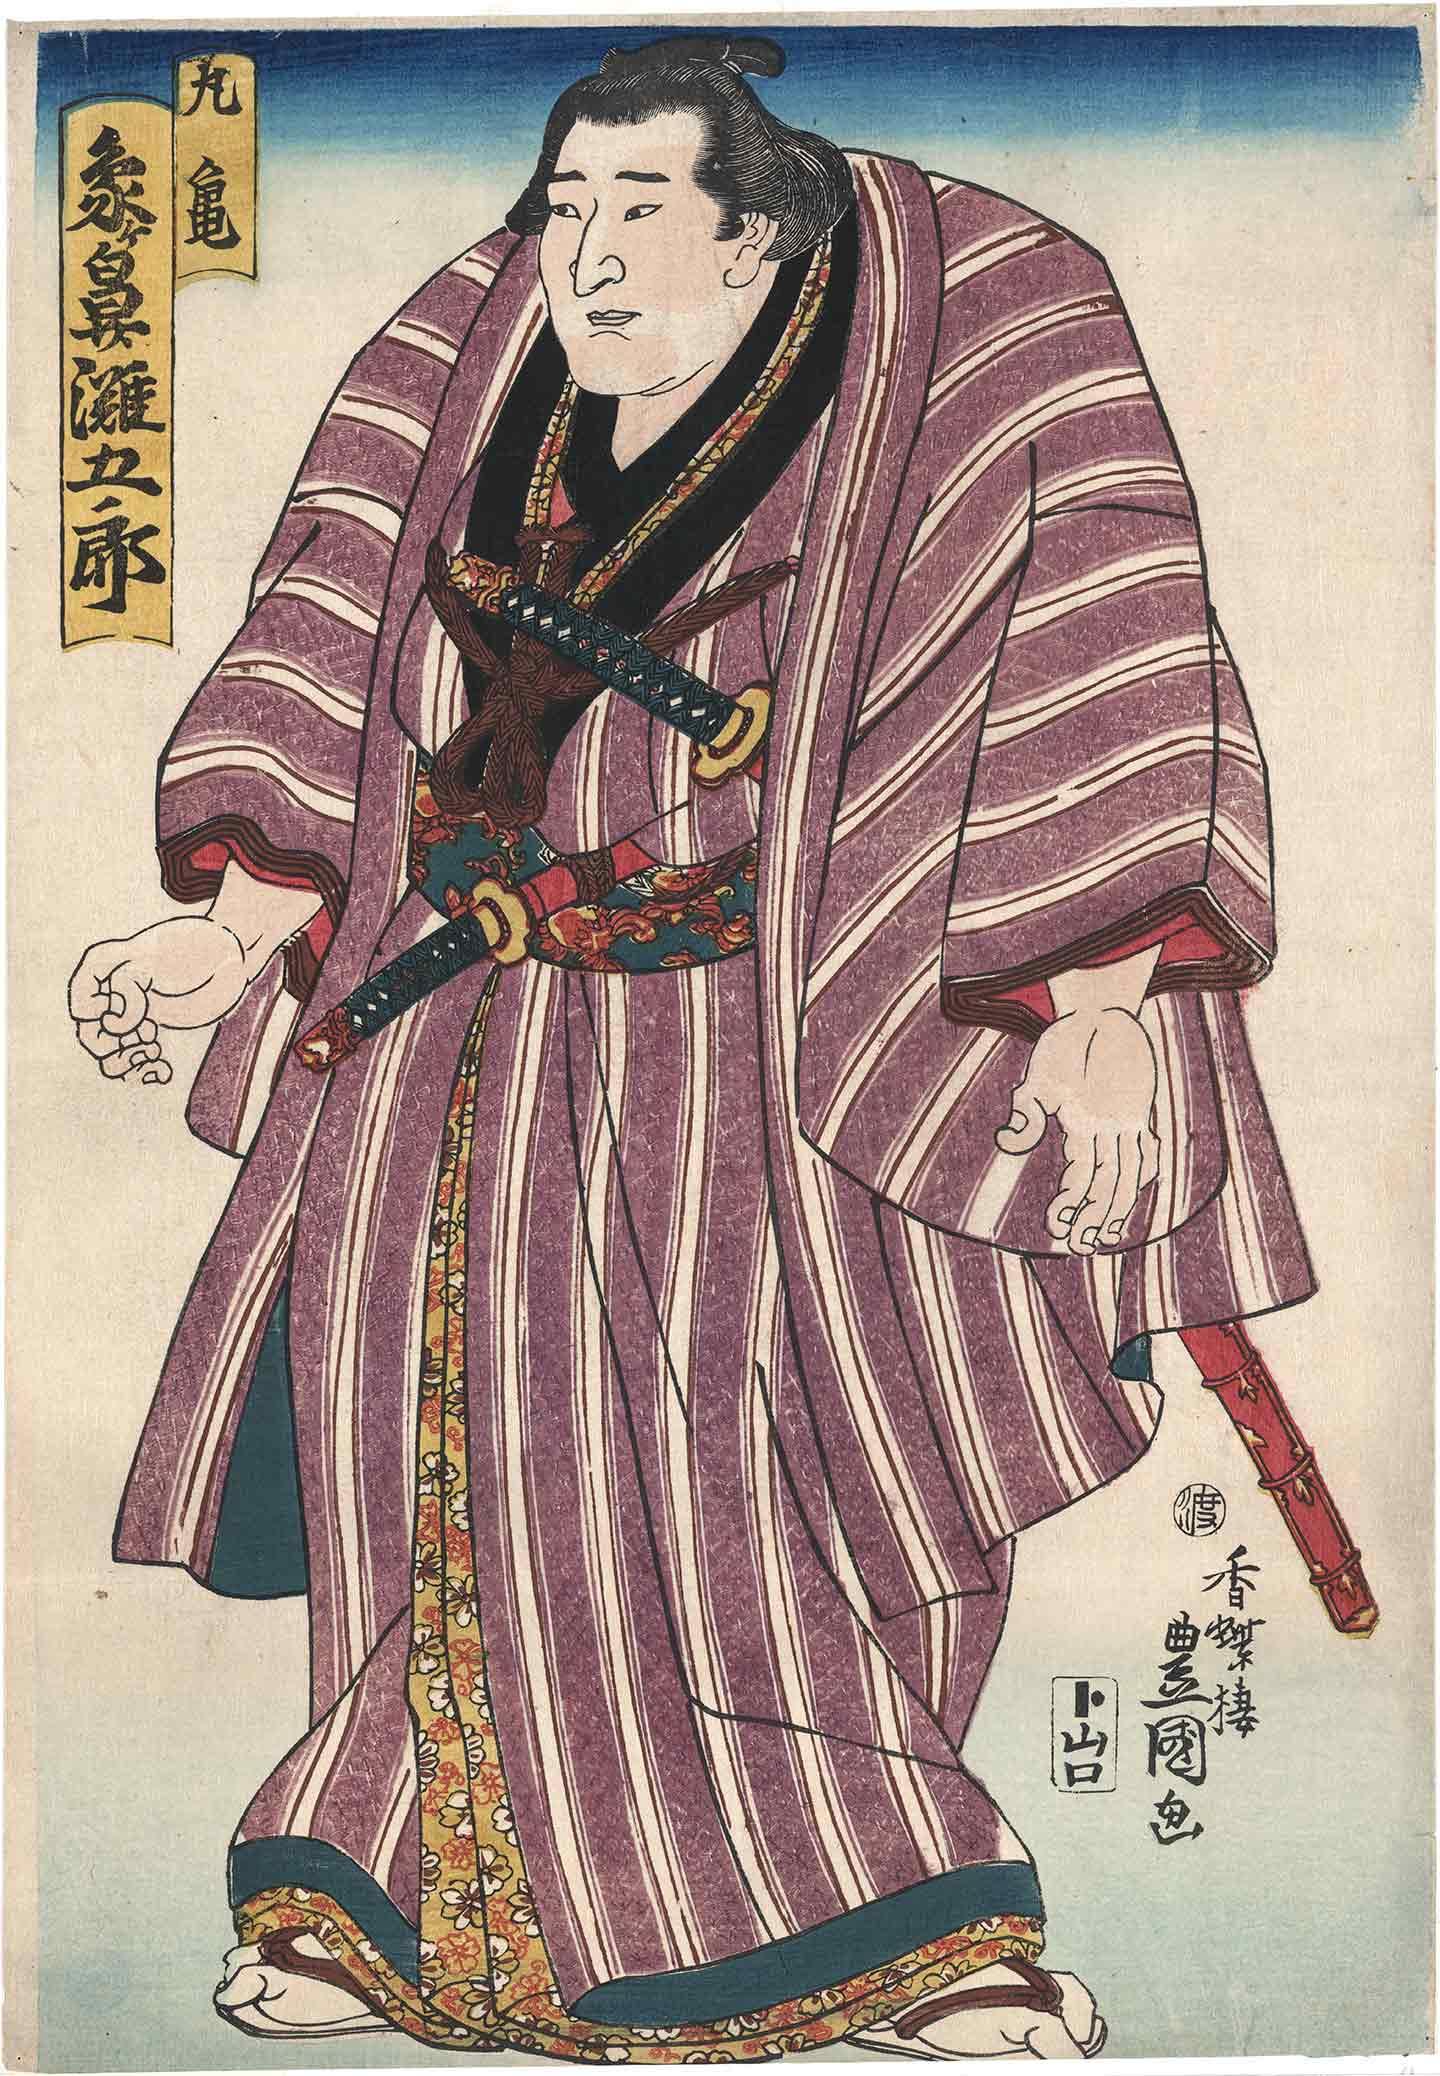 Full-length portrait of Zogahana Nadagoro, standing, facing left, wearing striped robe